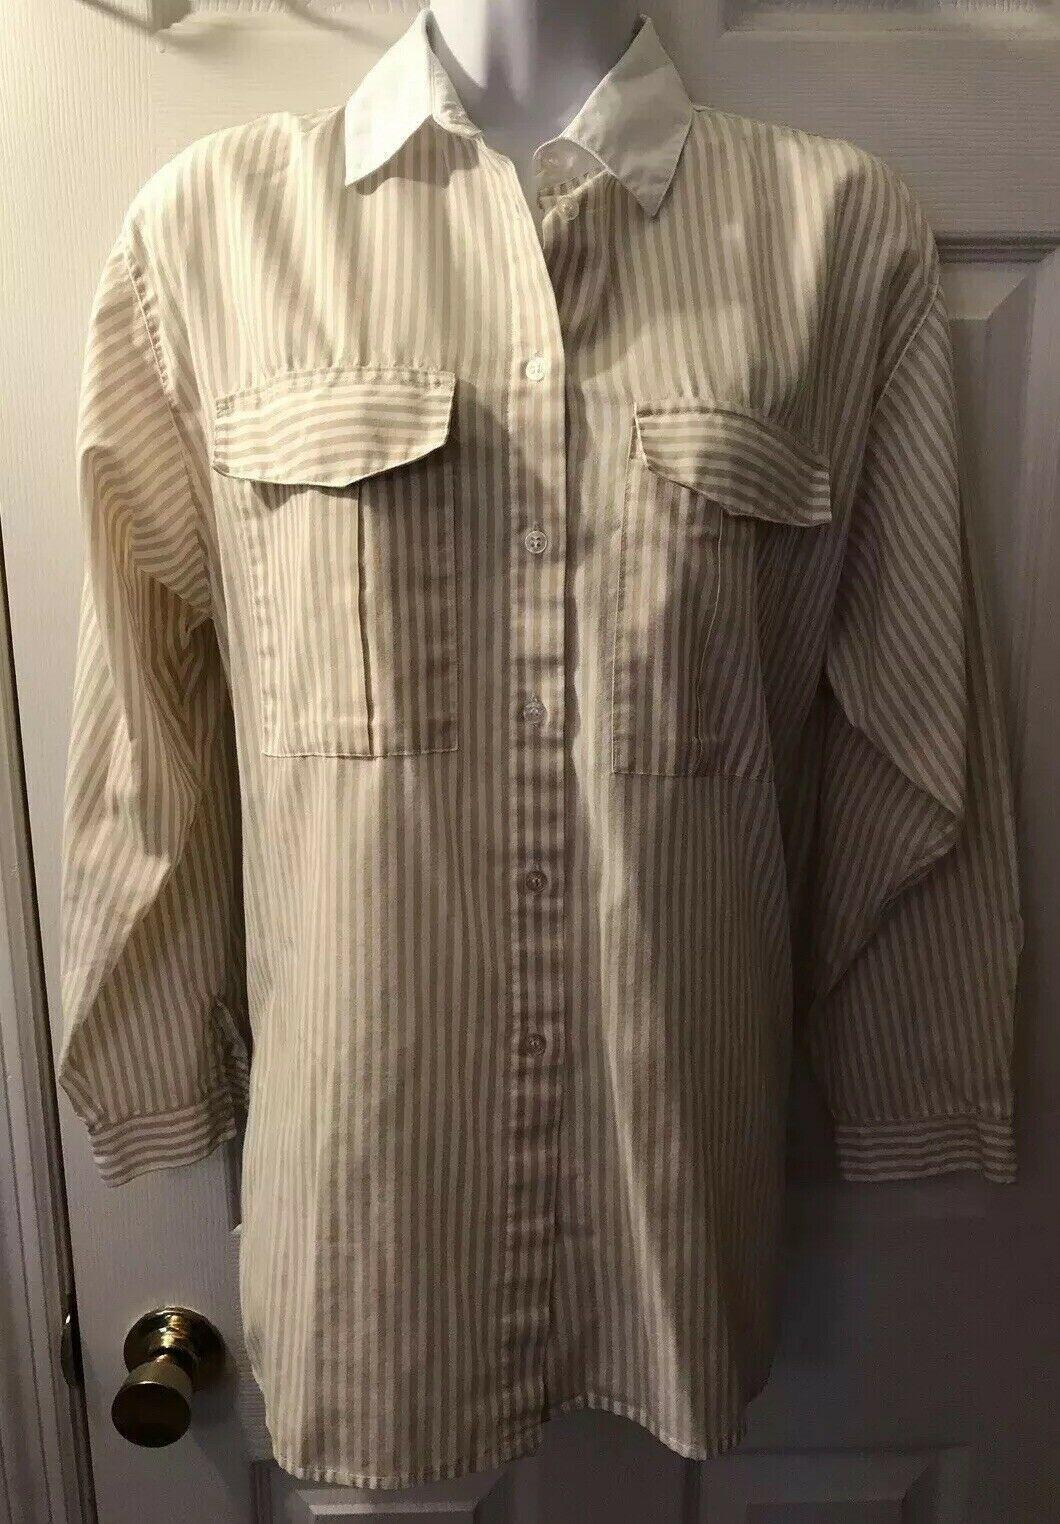 Vtg DIANE VON FURSTENBERG Striped Button Down Shirt DVF White Tan Blouse Top 14